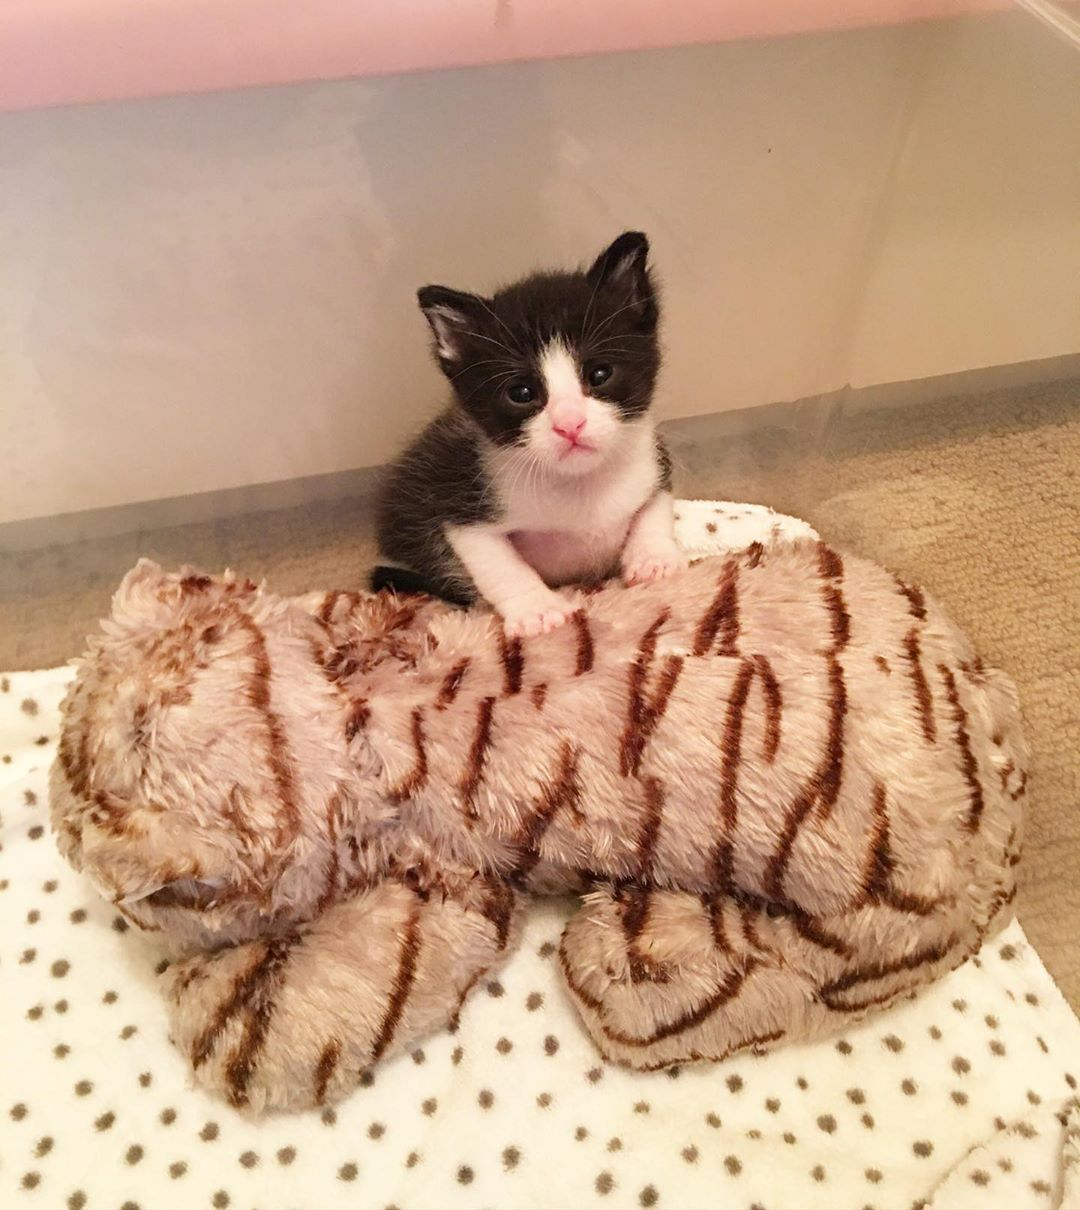 Pequeño gatito